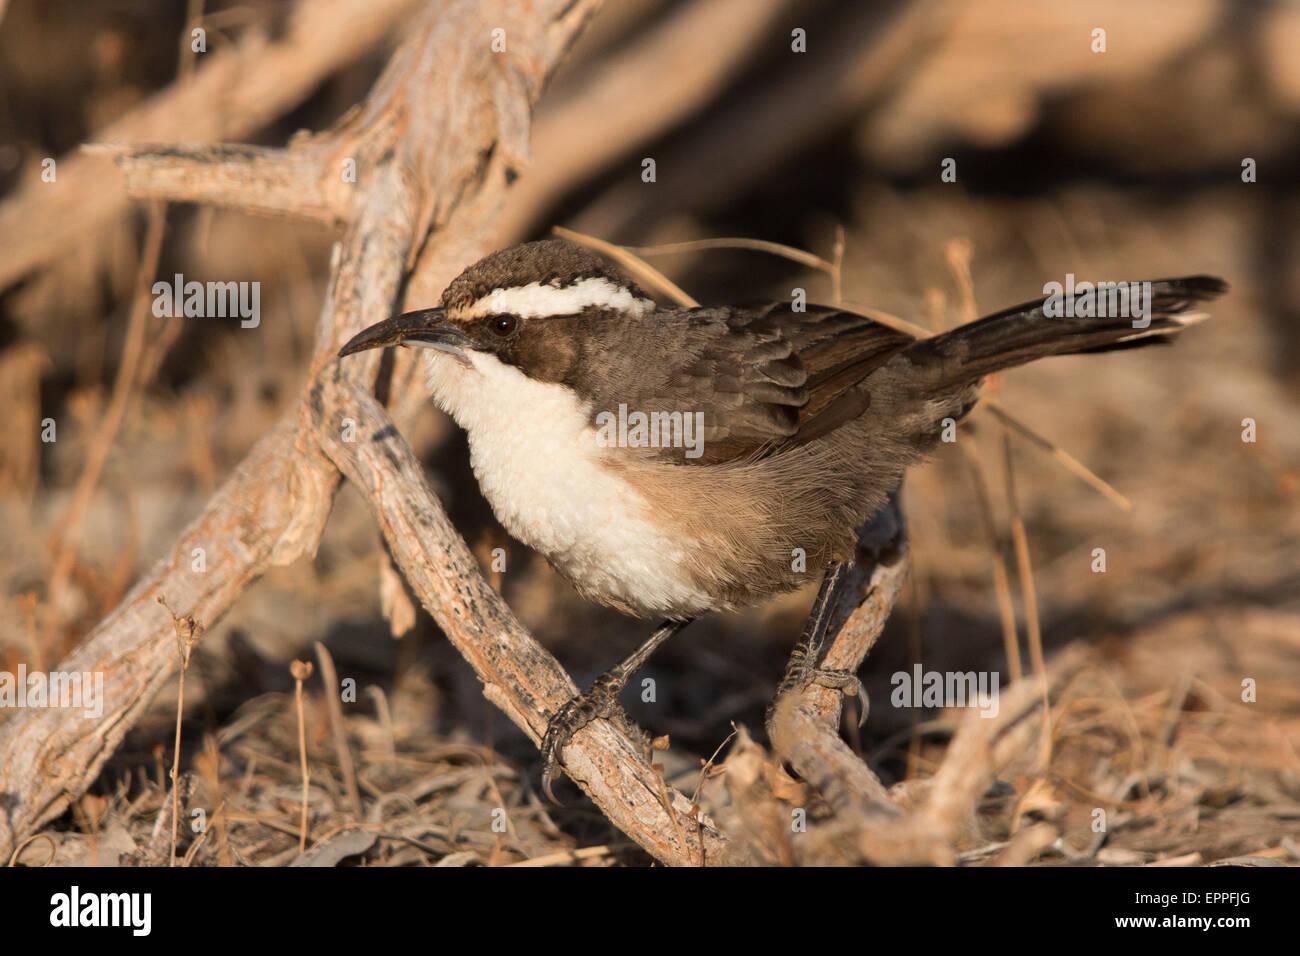 White-browed Babbler (Pomatostomus superciliosus) - Stock Image